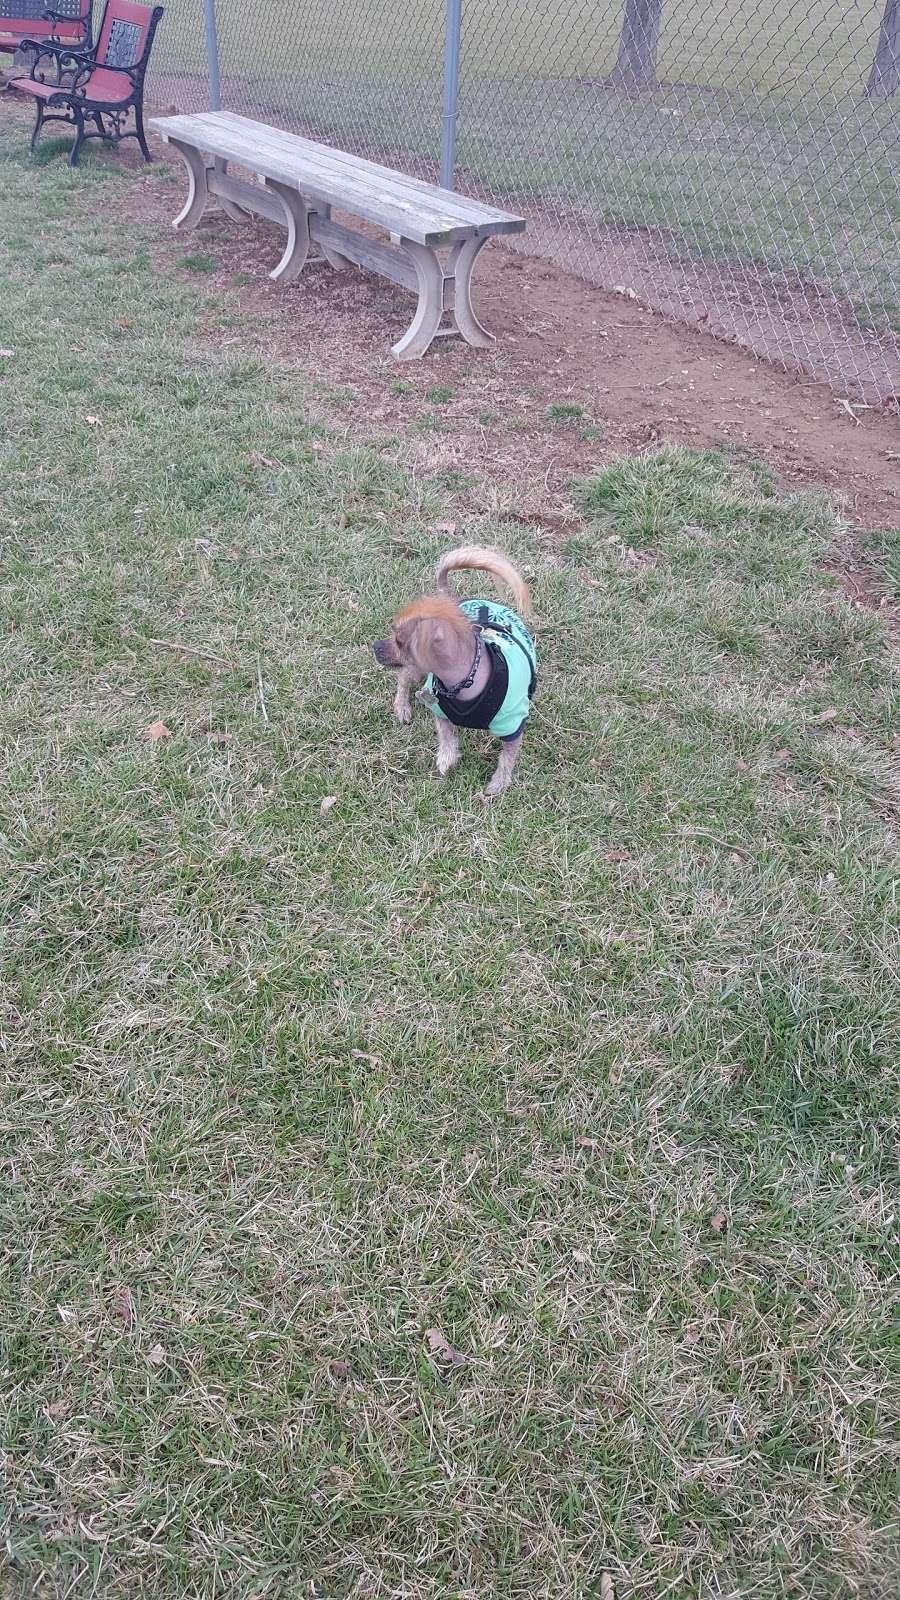 Kutztown Dog Park - park  | Photo 9 of 10 | Address: 325 S Laurel St, Kutztown, PA 19530, USA